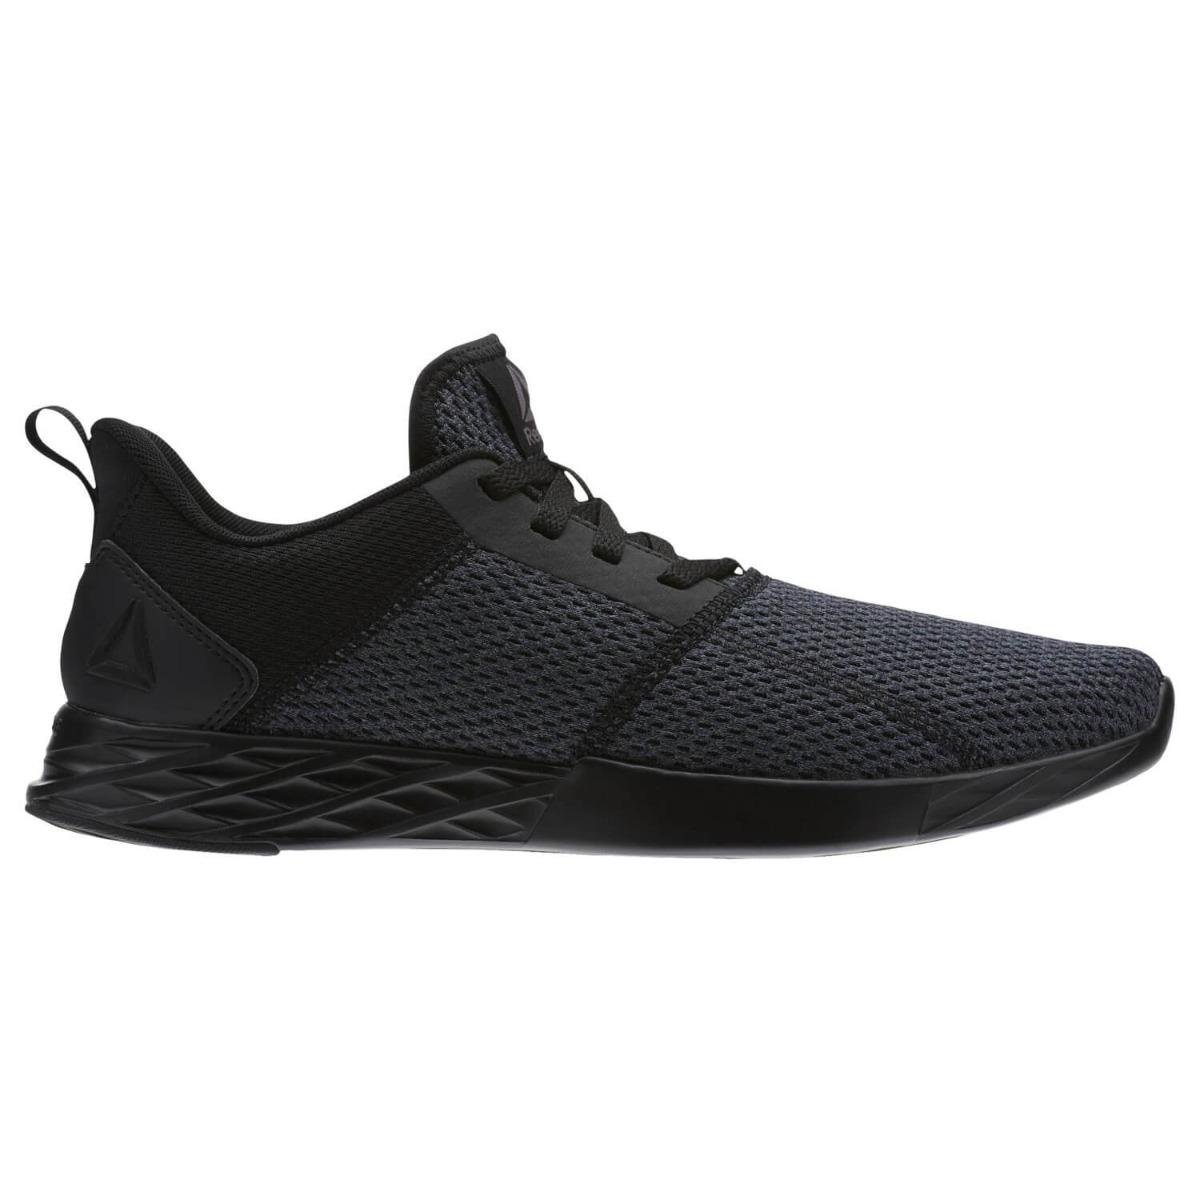 11a1ac765d13 Reebok Astroride Strike Men s Shoes